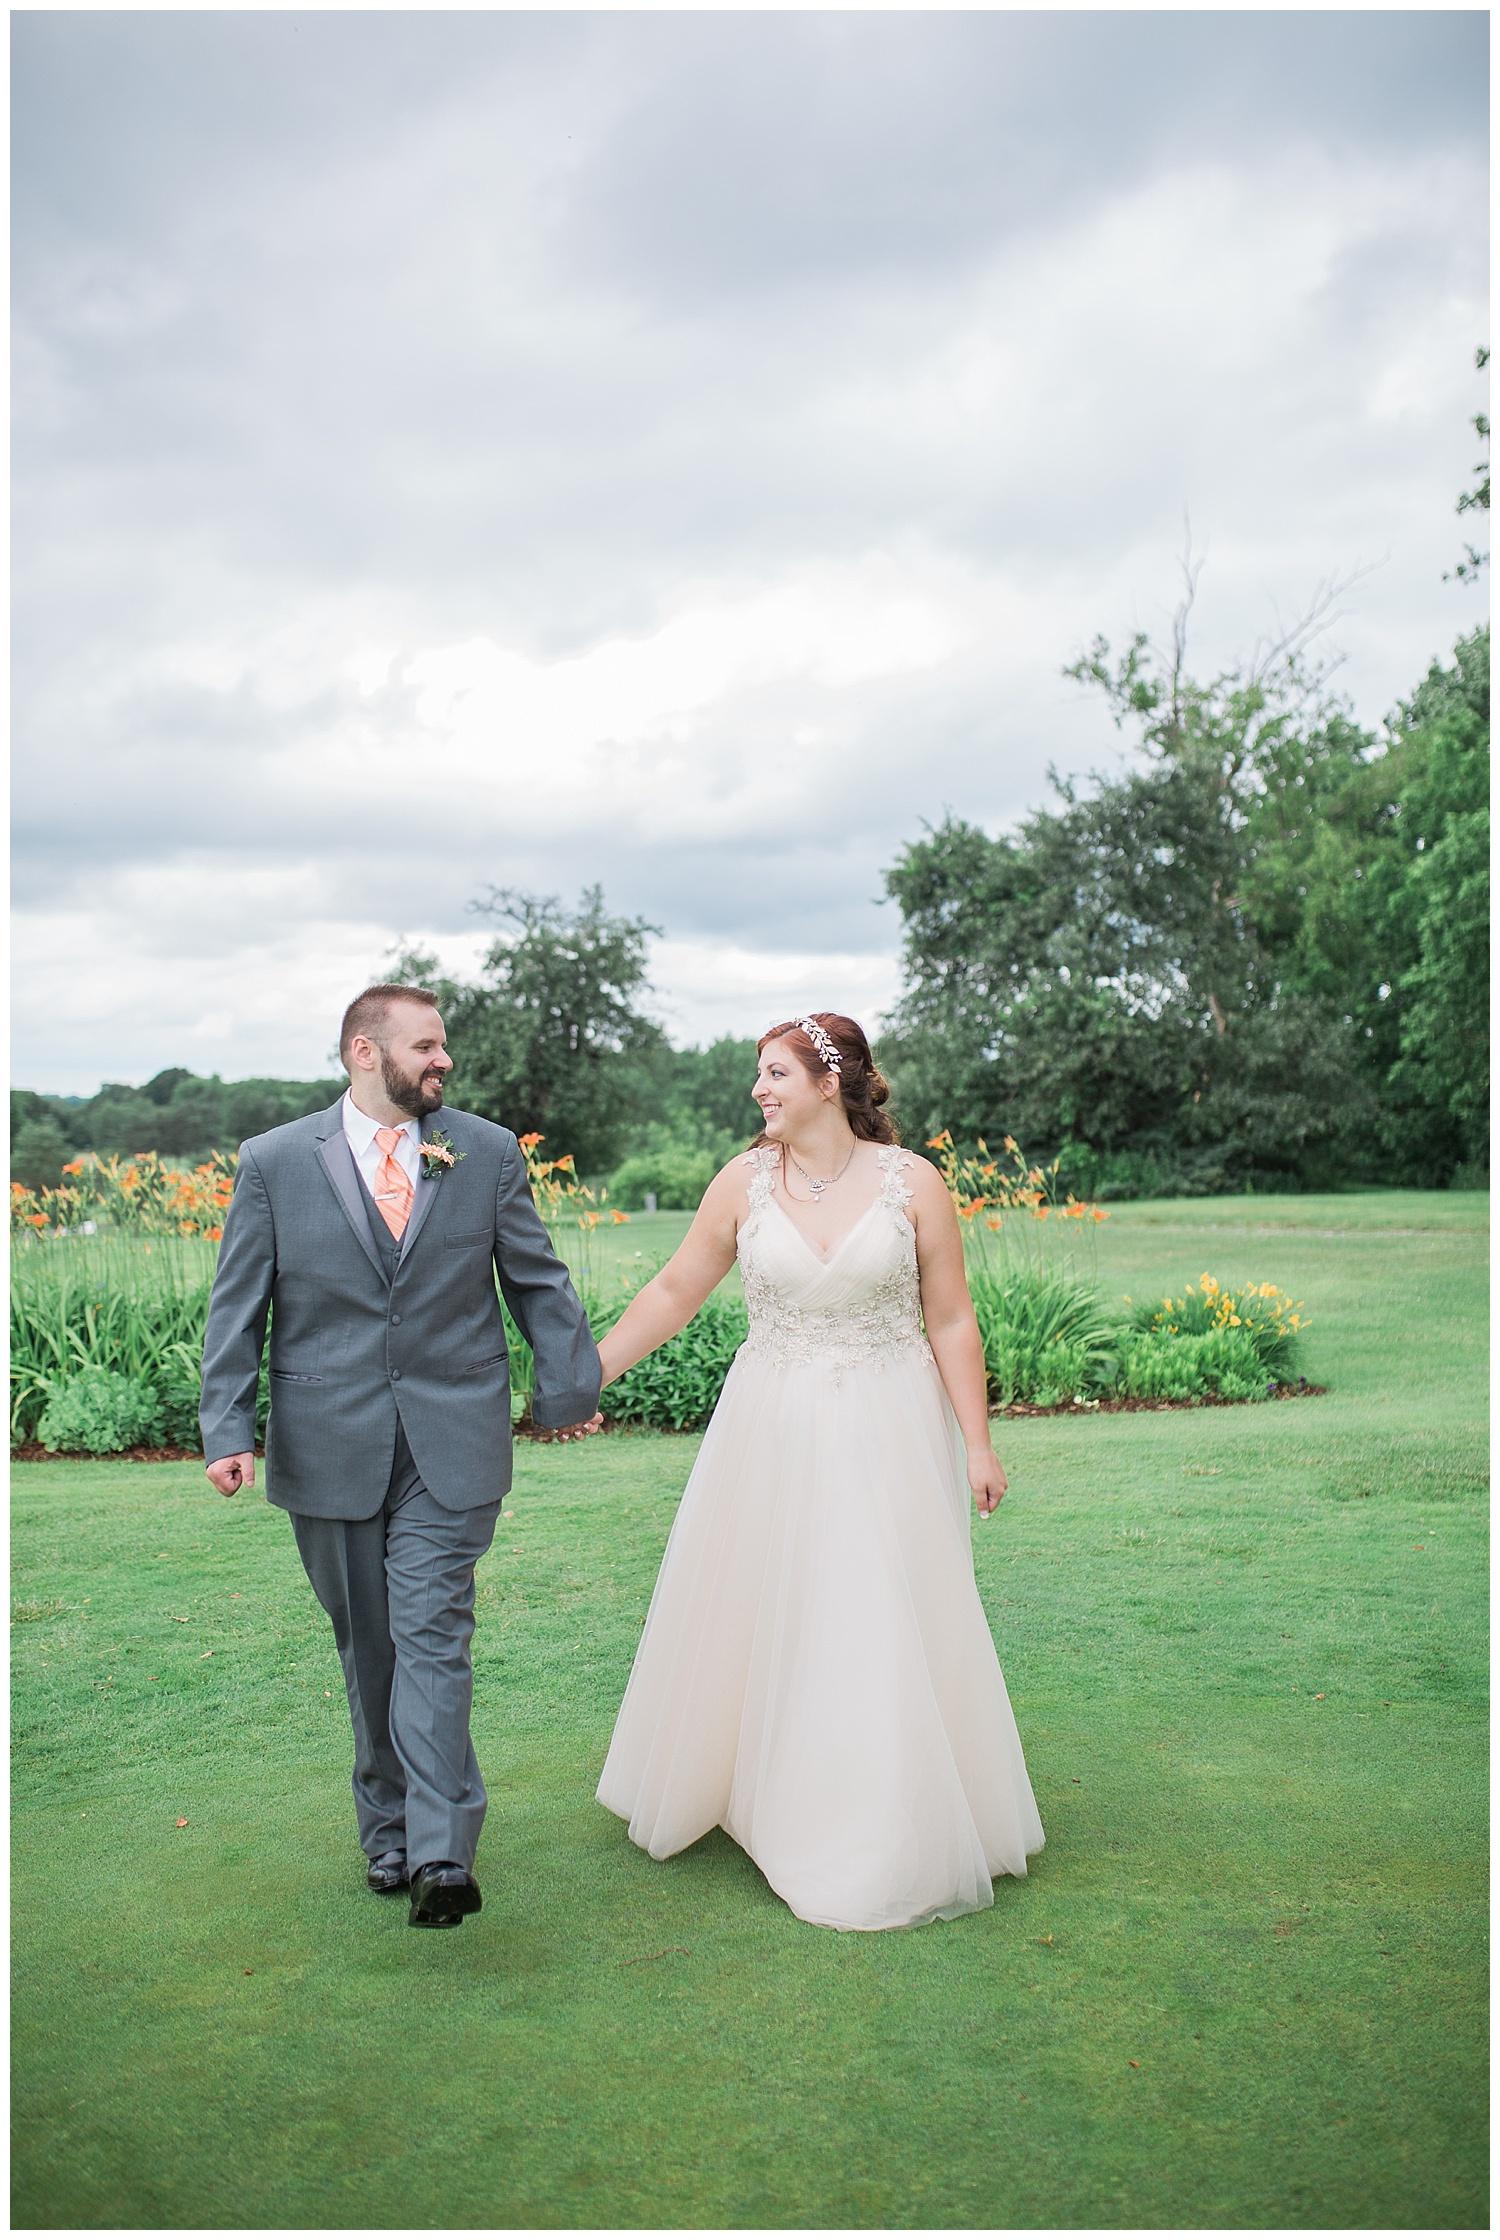 Brian and Molly Wed in Conesus NY - Lass & Beau-849_Buffalo wedding photography.jpg